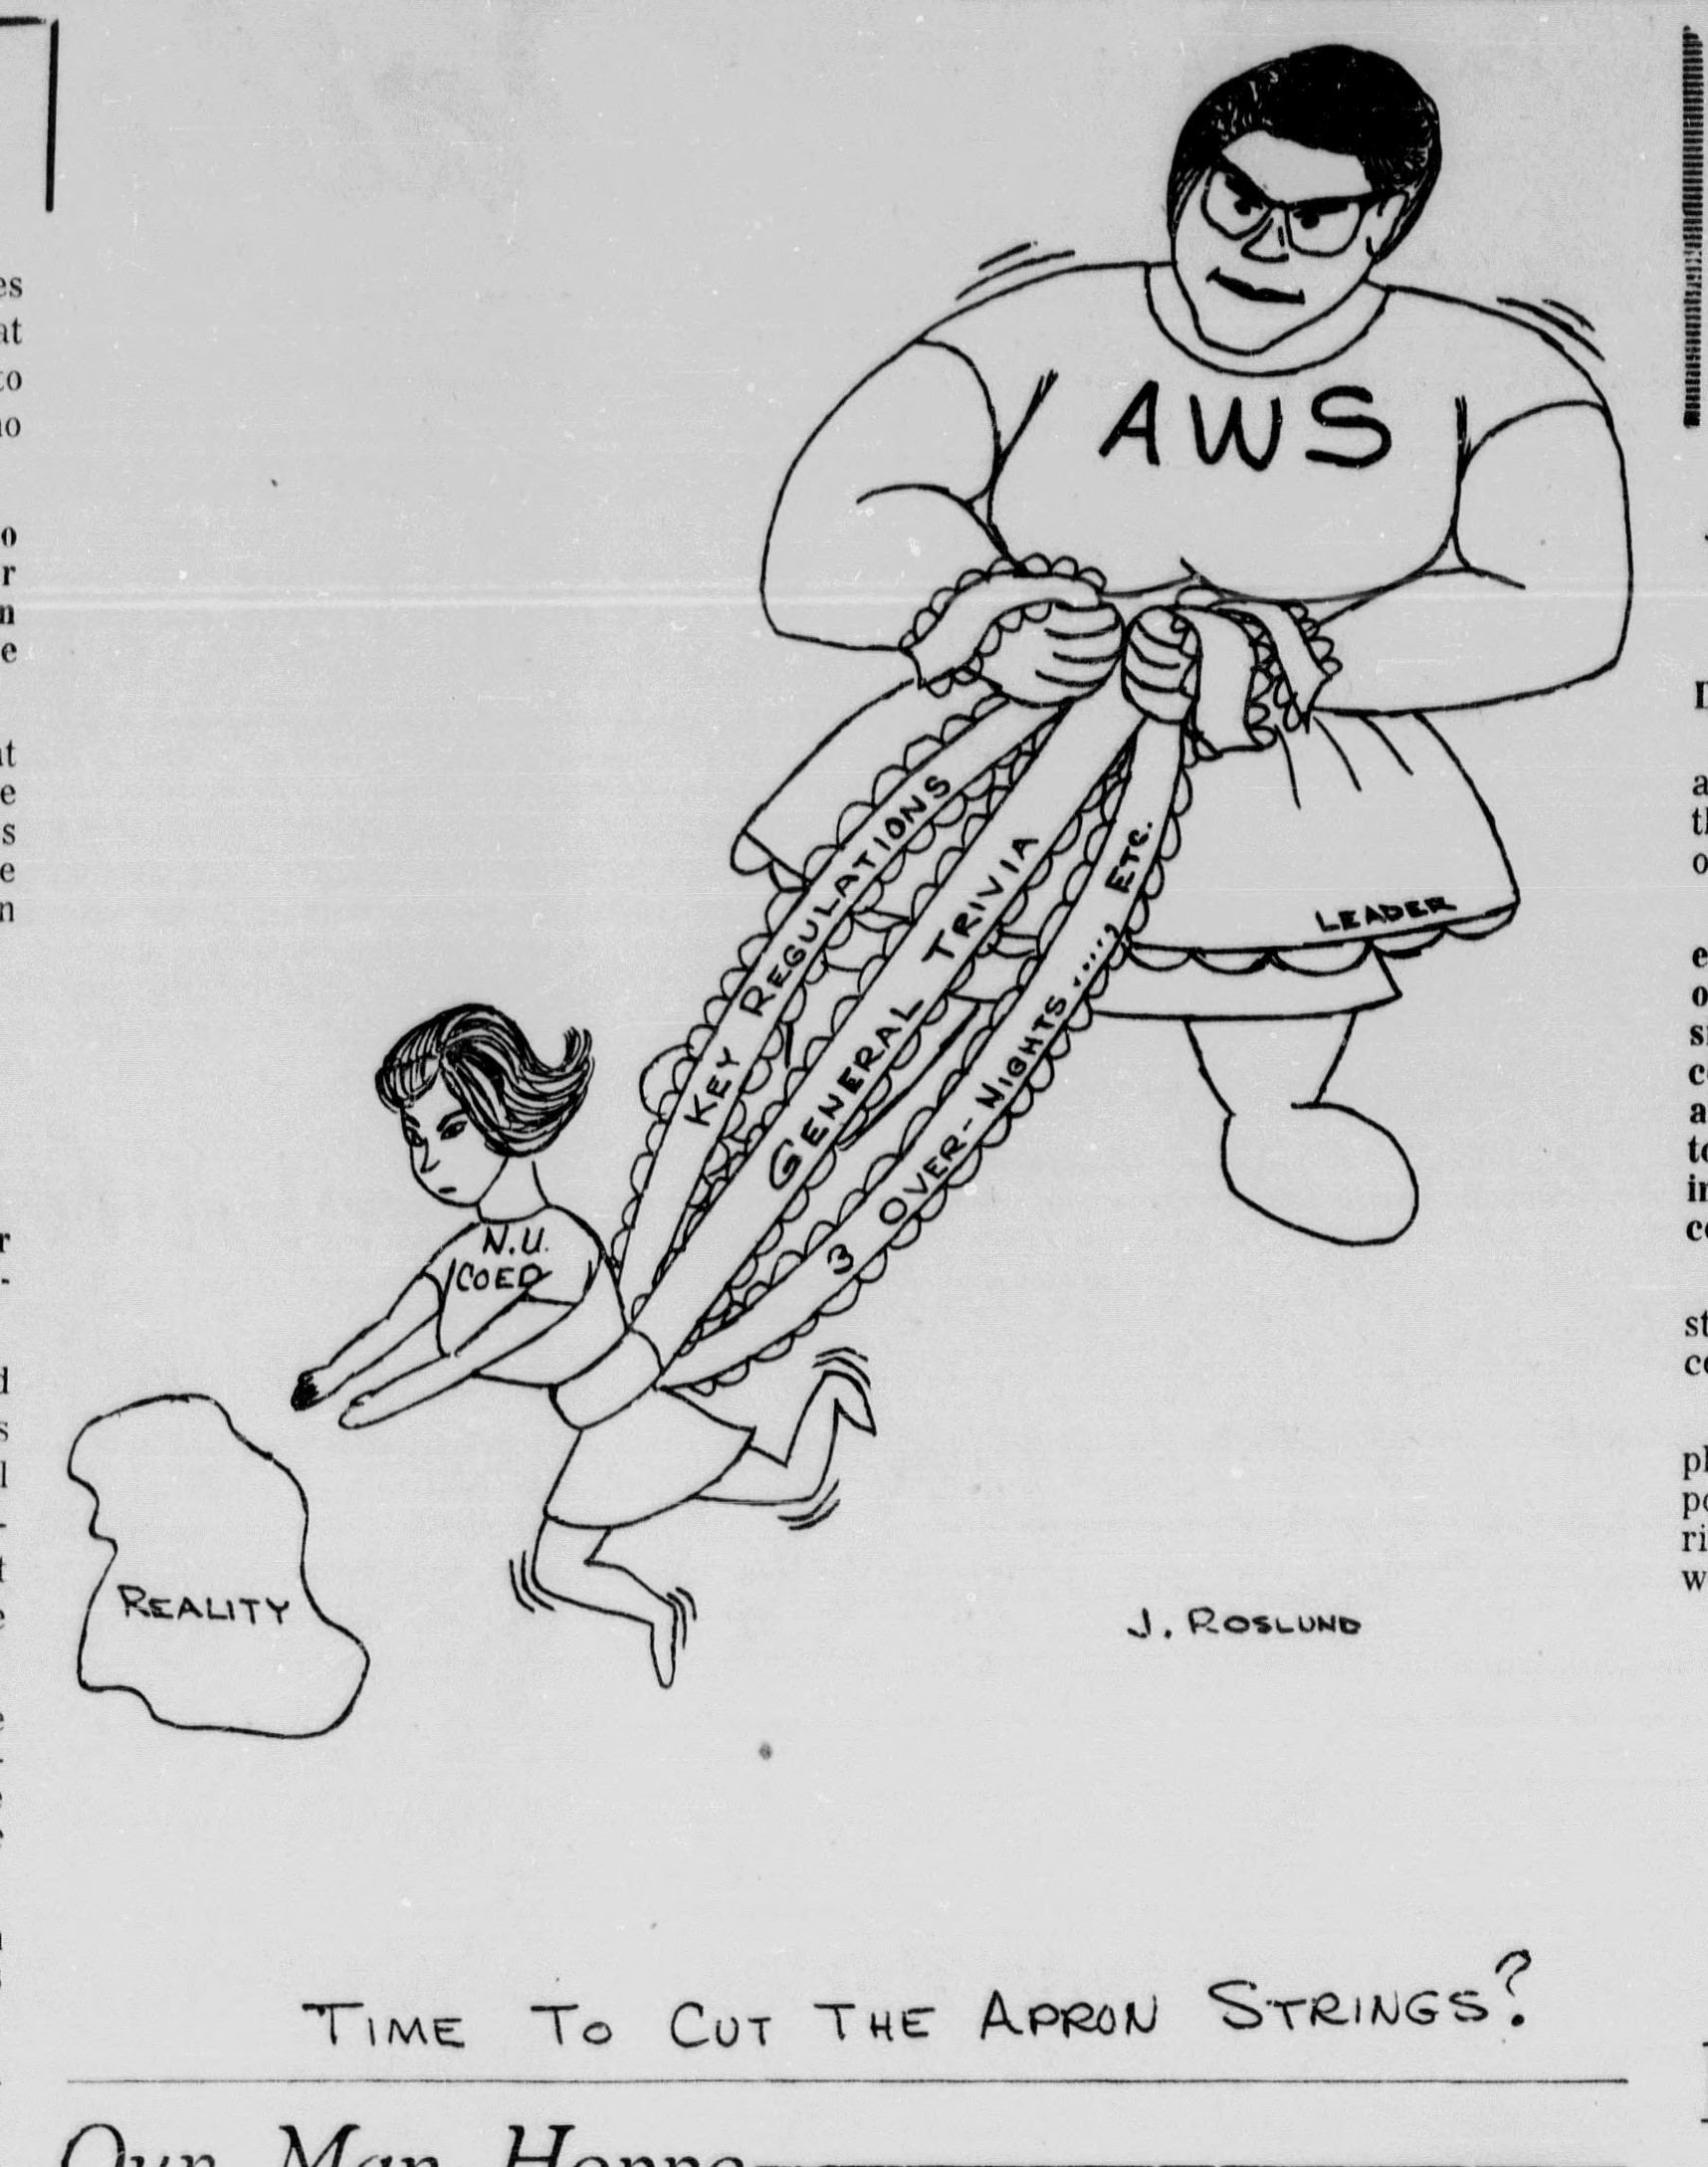 J. Roslung cartoon